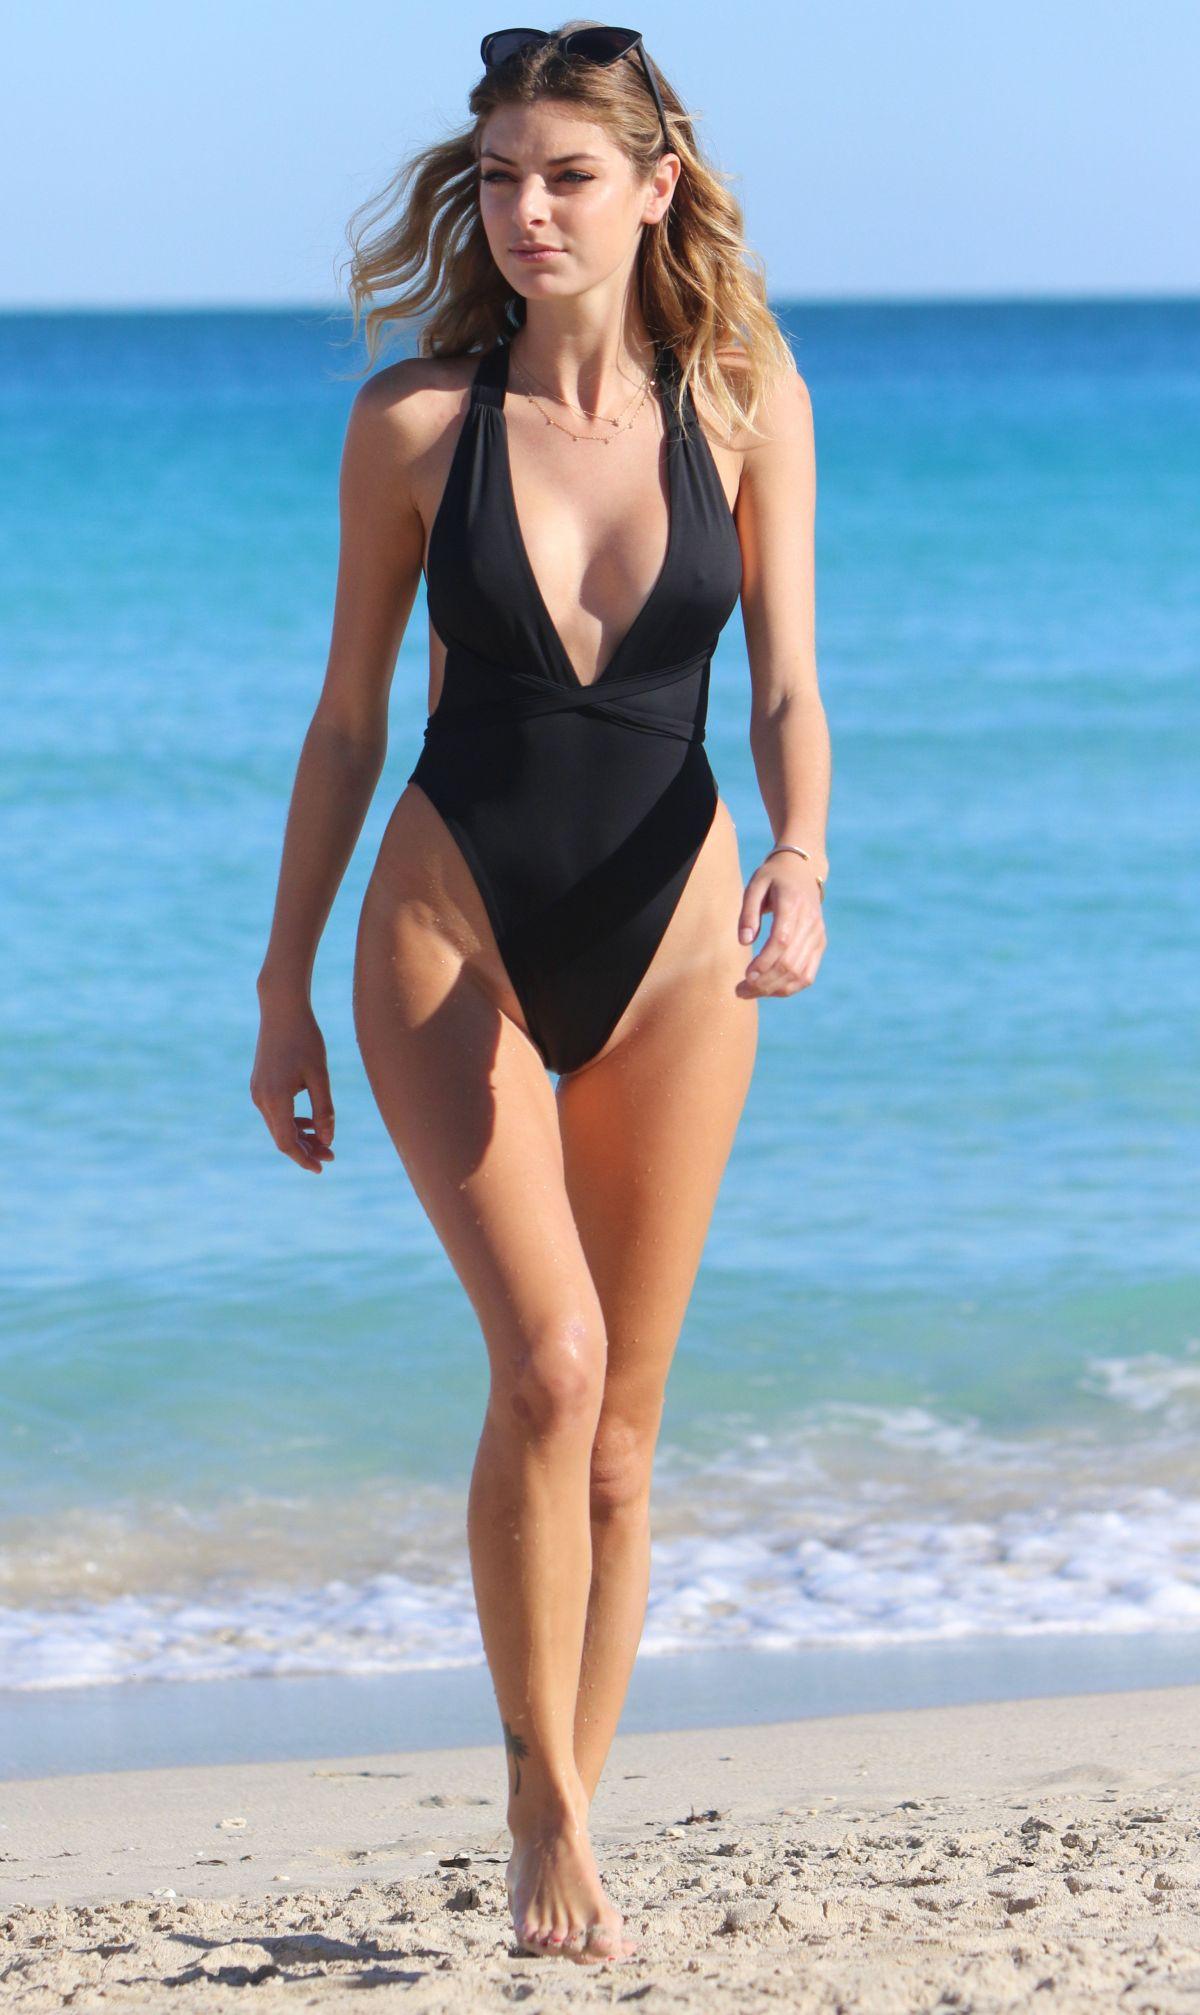 Celebrites Natalie MCelebritesenet nudes (37 images), Leaked